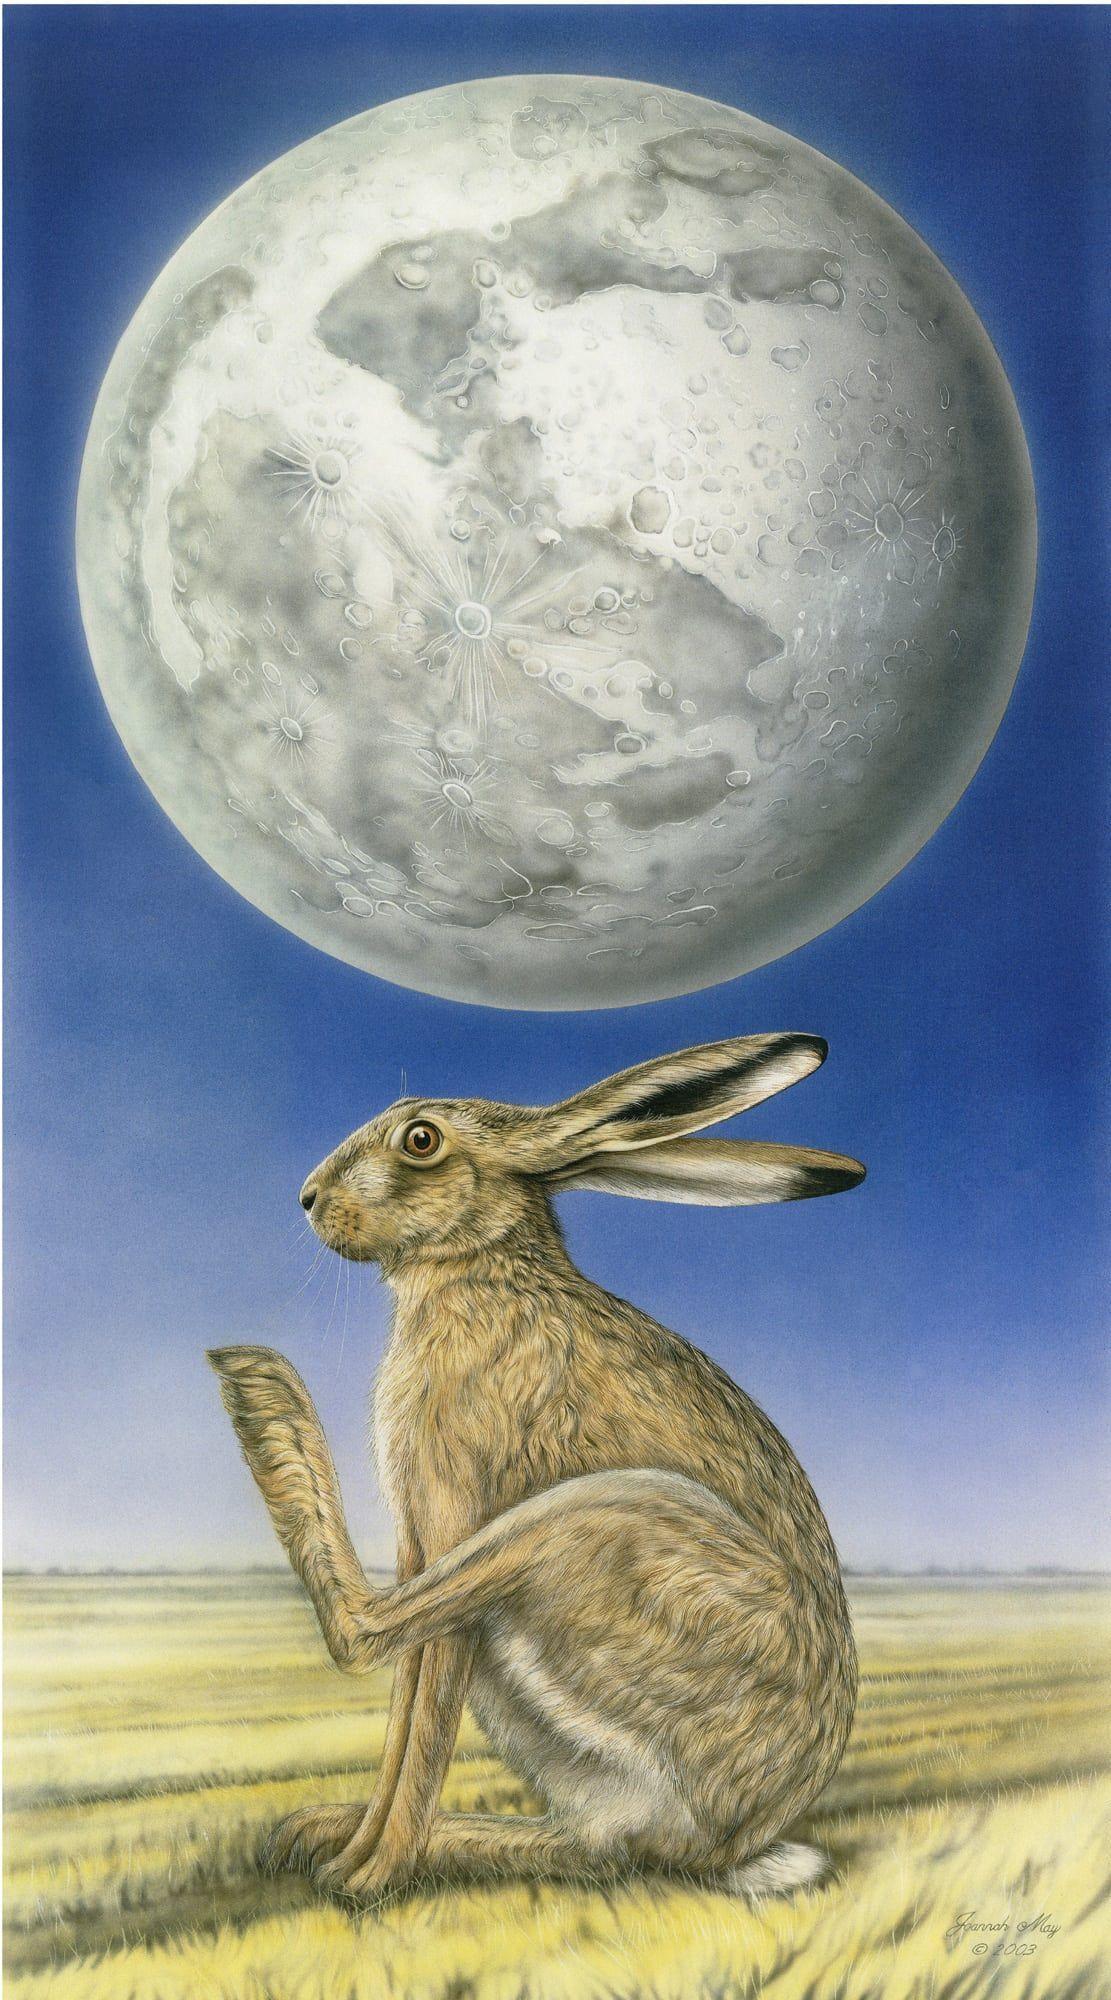 Луна фото где великий заяц